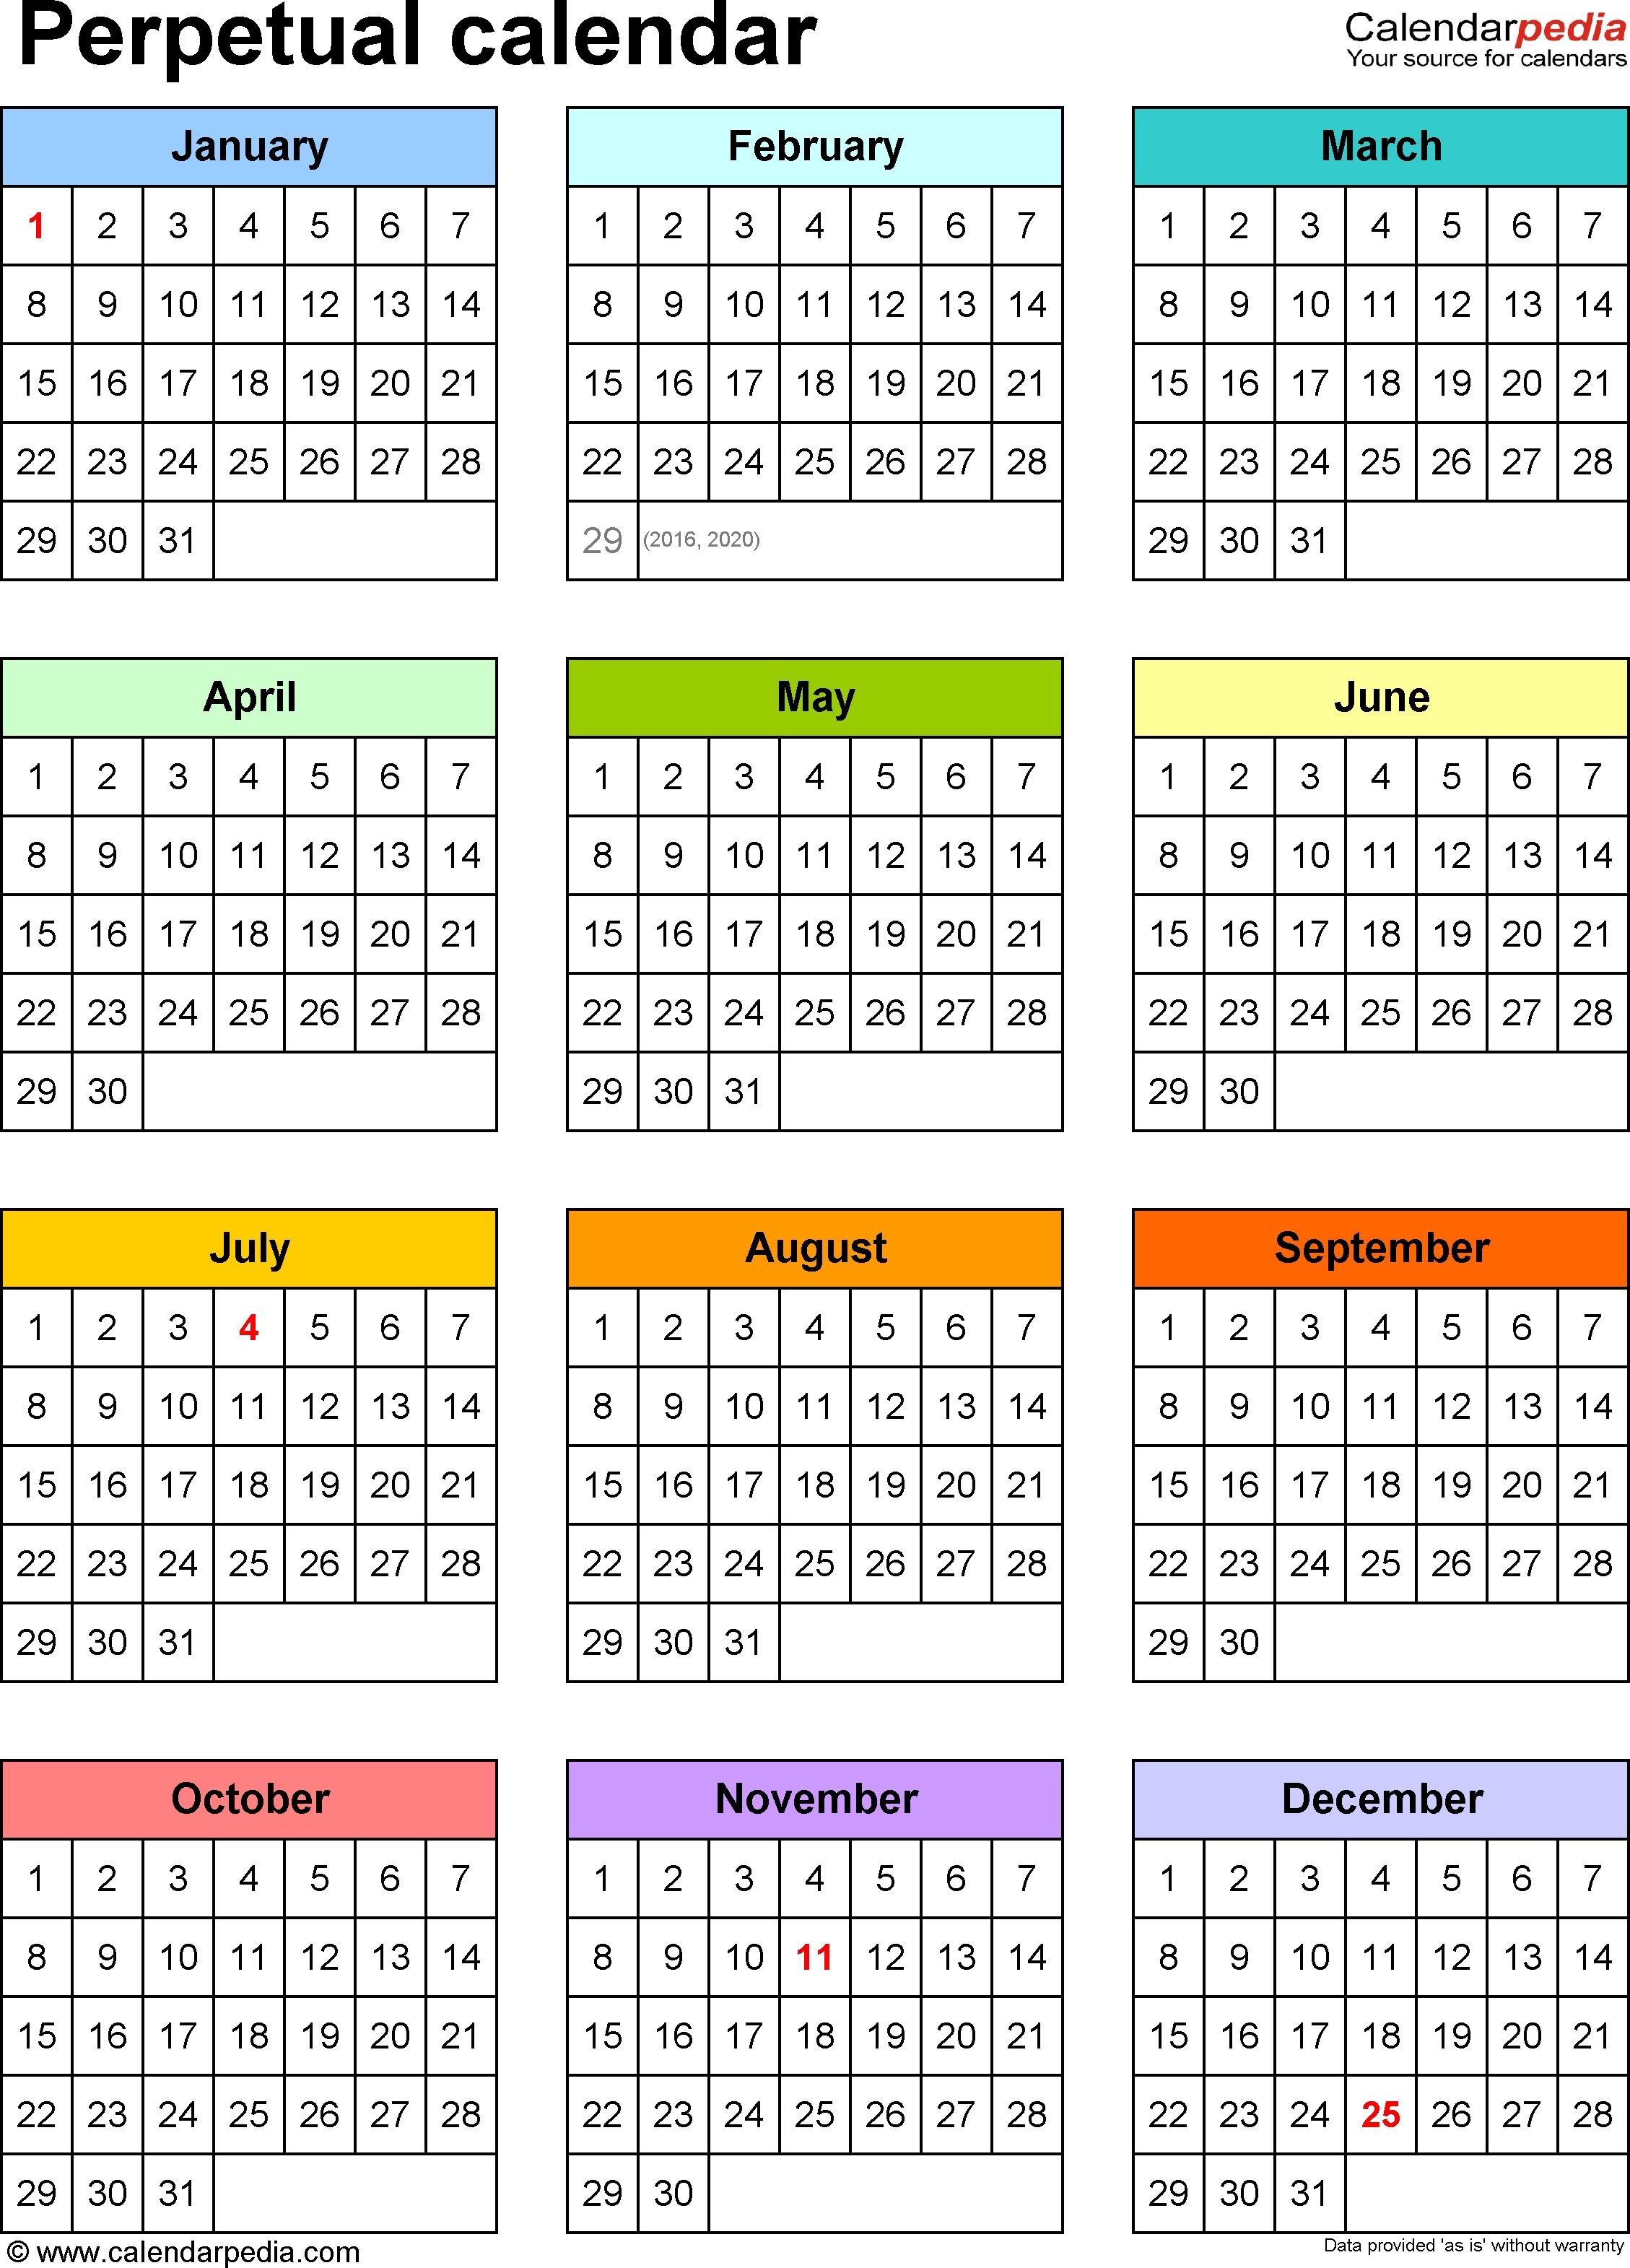 Perpetual Calendars - 7 Free Printable Excel Templates for Free Printable Perpetual Calendar Templates